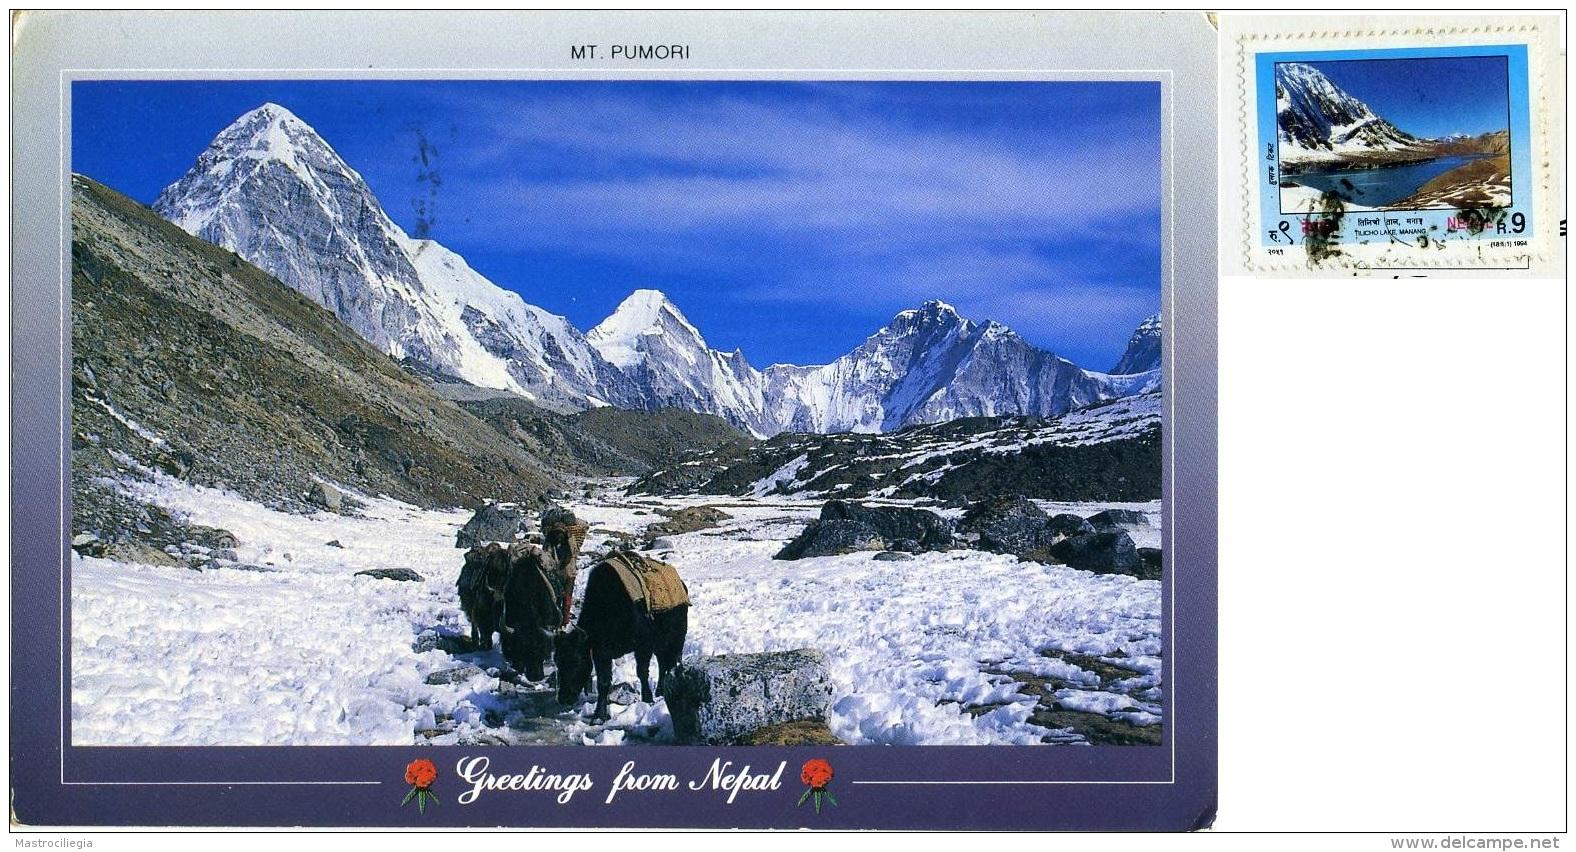 NEPAL  Greetings From.. Mt. Pumori  Near Kalapatthar Everest  Nice Stamp - Nepal